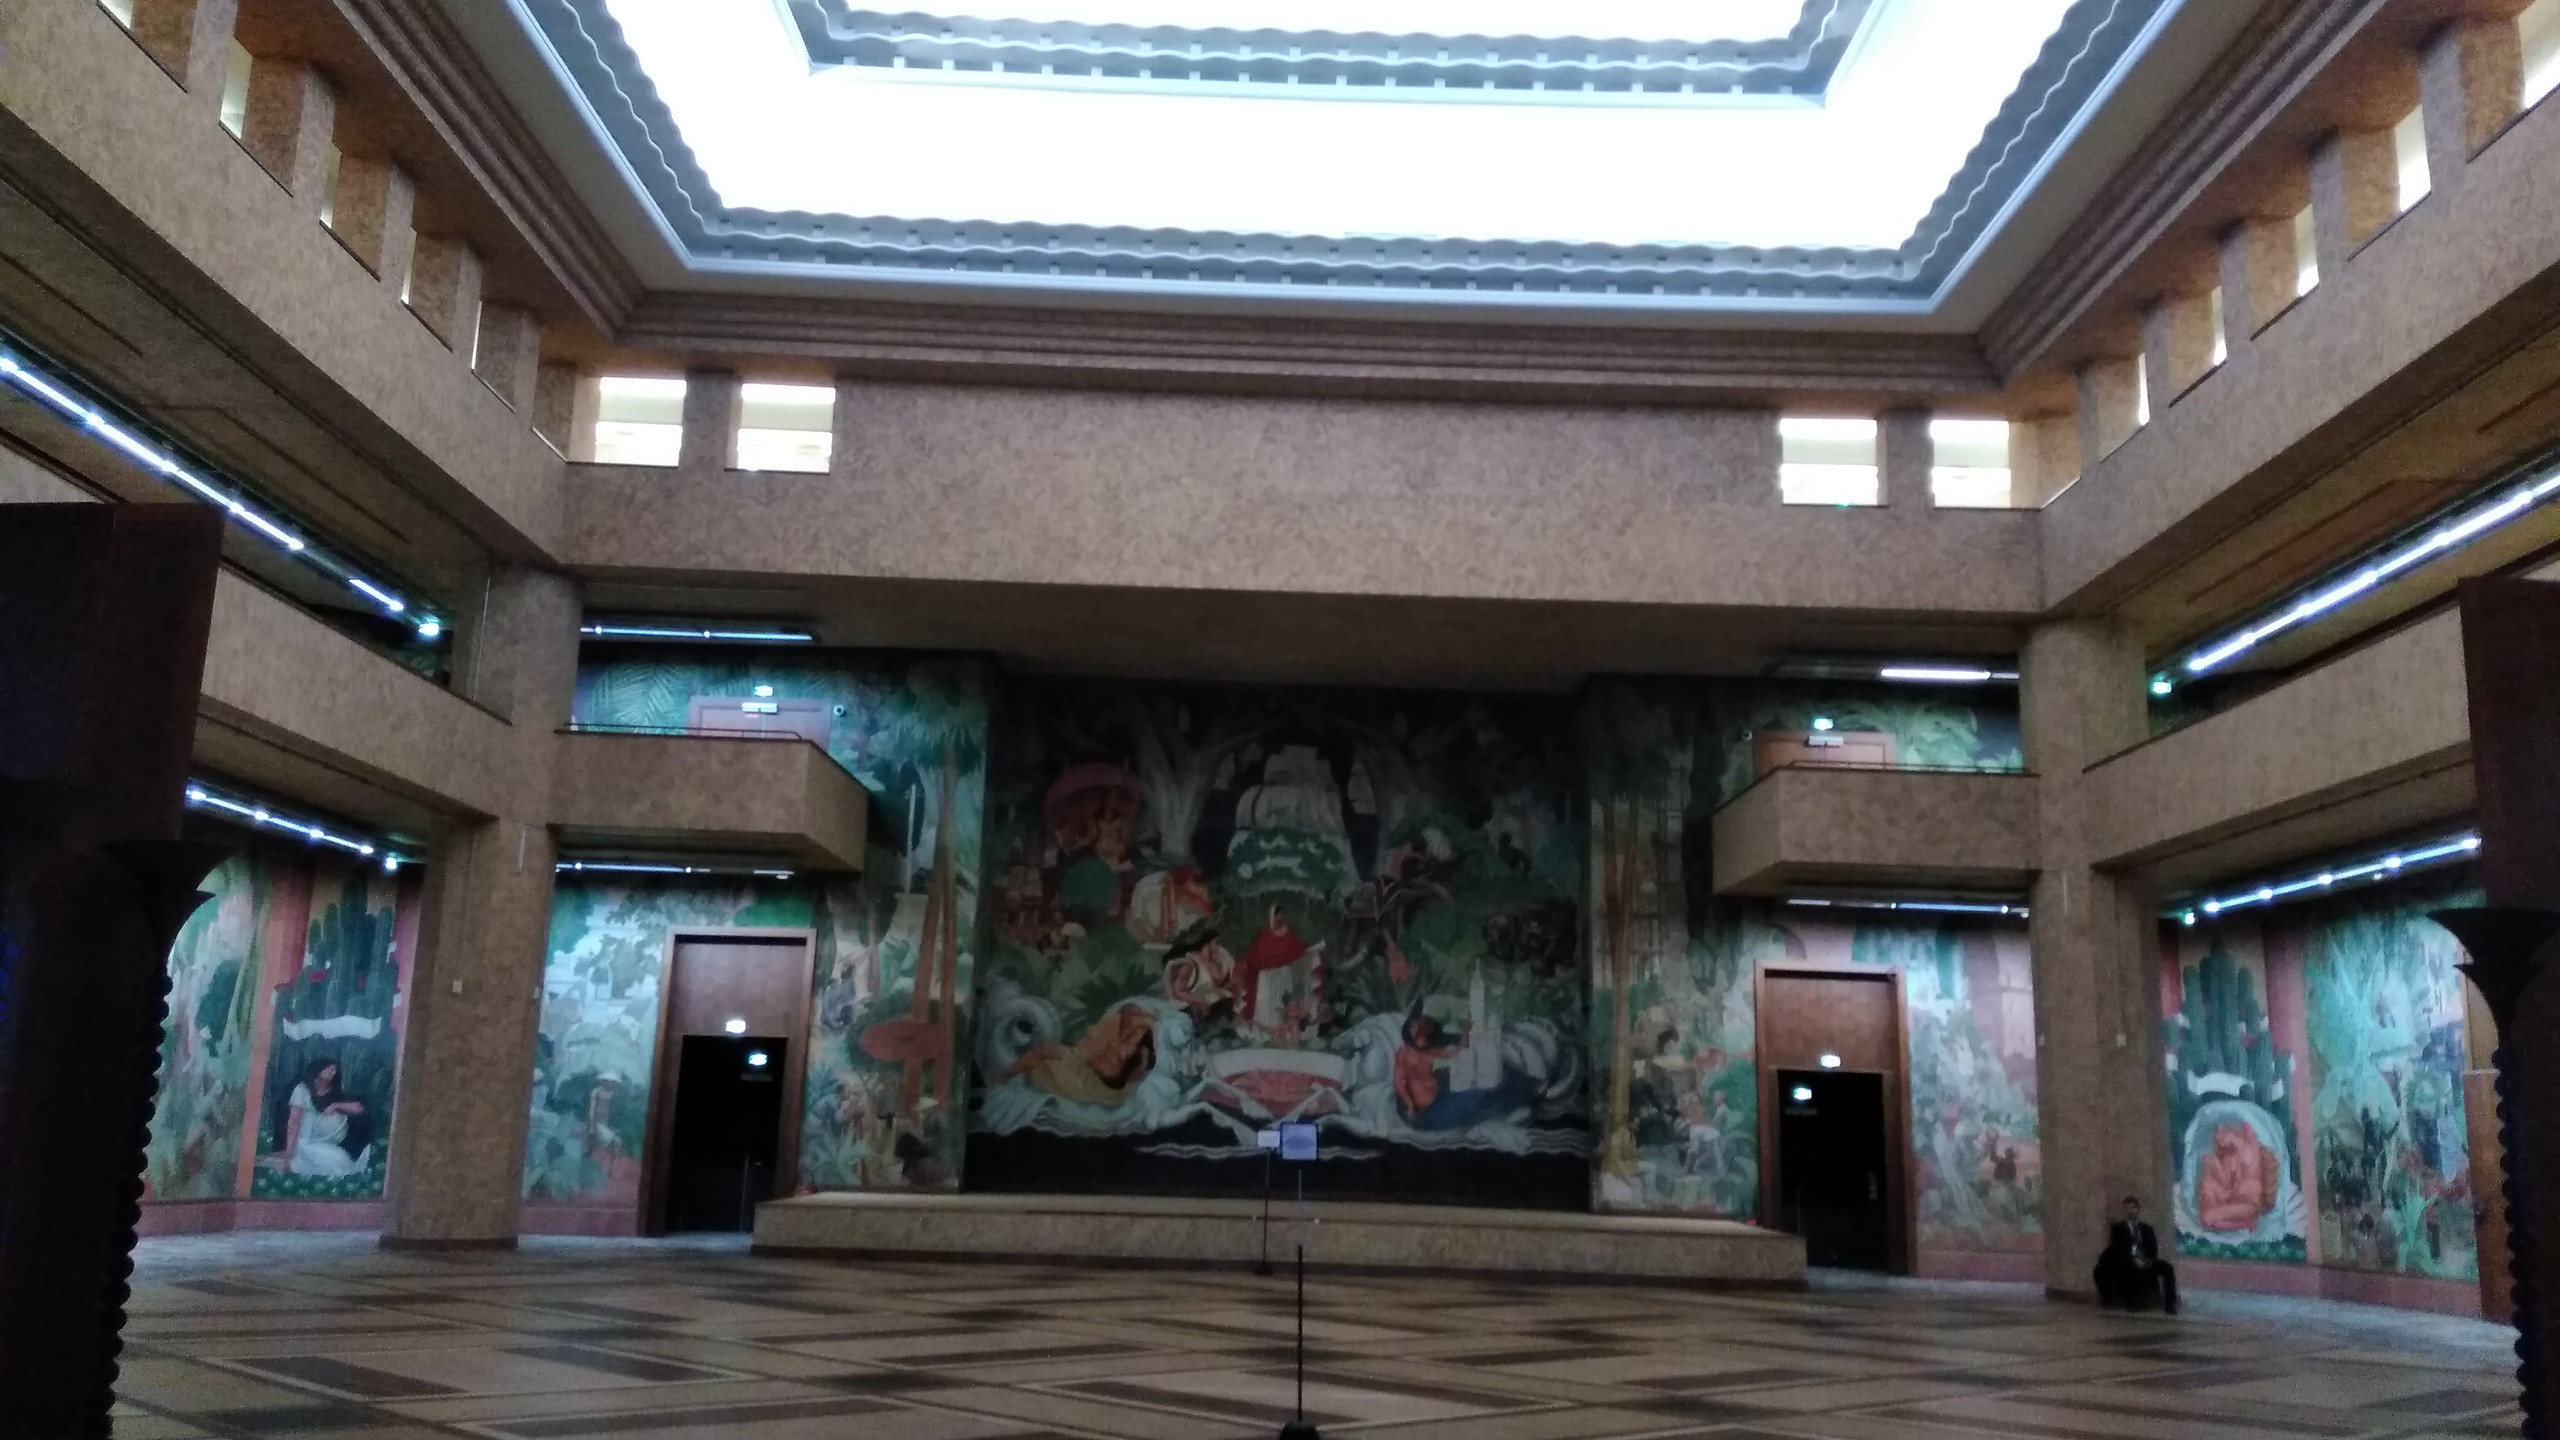 Palais de la Porte Dorée - Interior